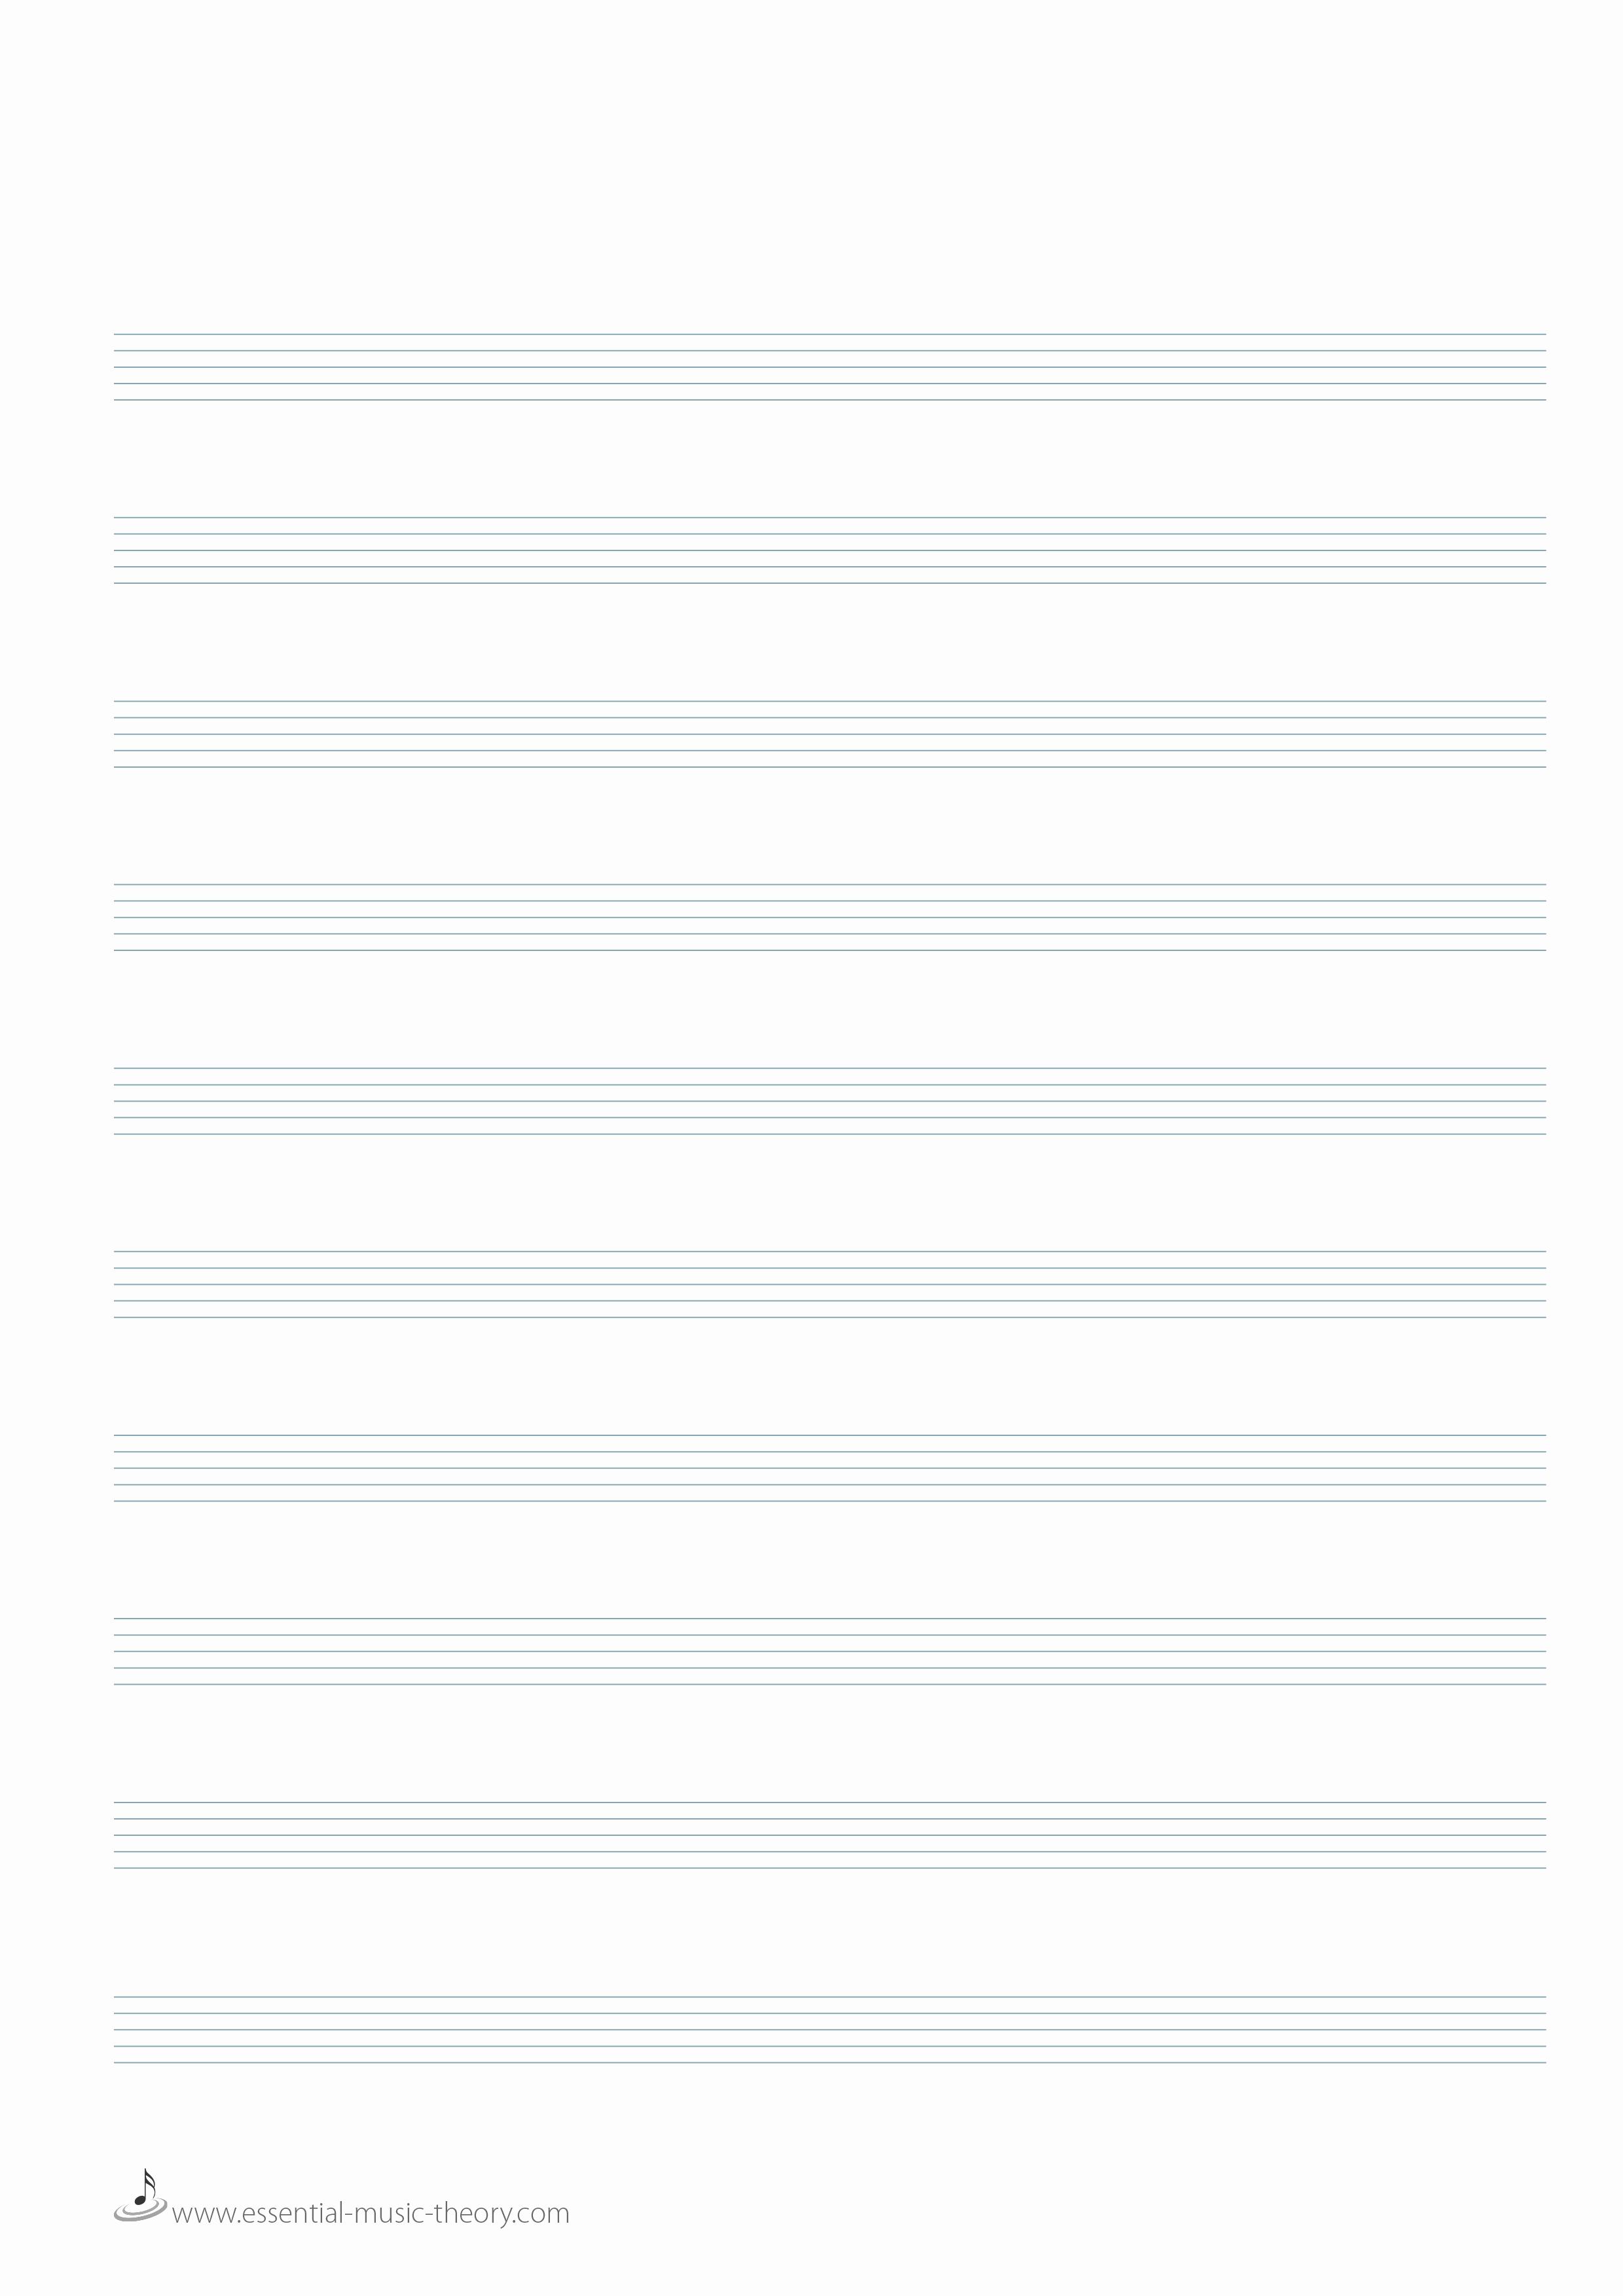 12 Stave Manuscript Paper Pdf Lovely Blank Manuscript Paper